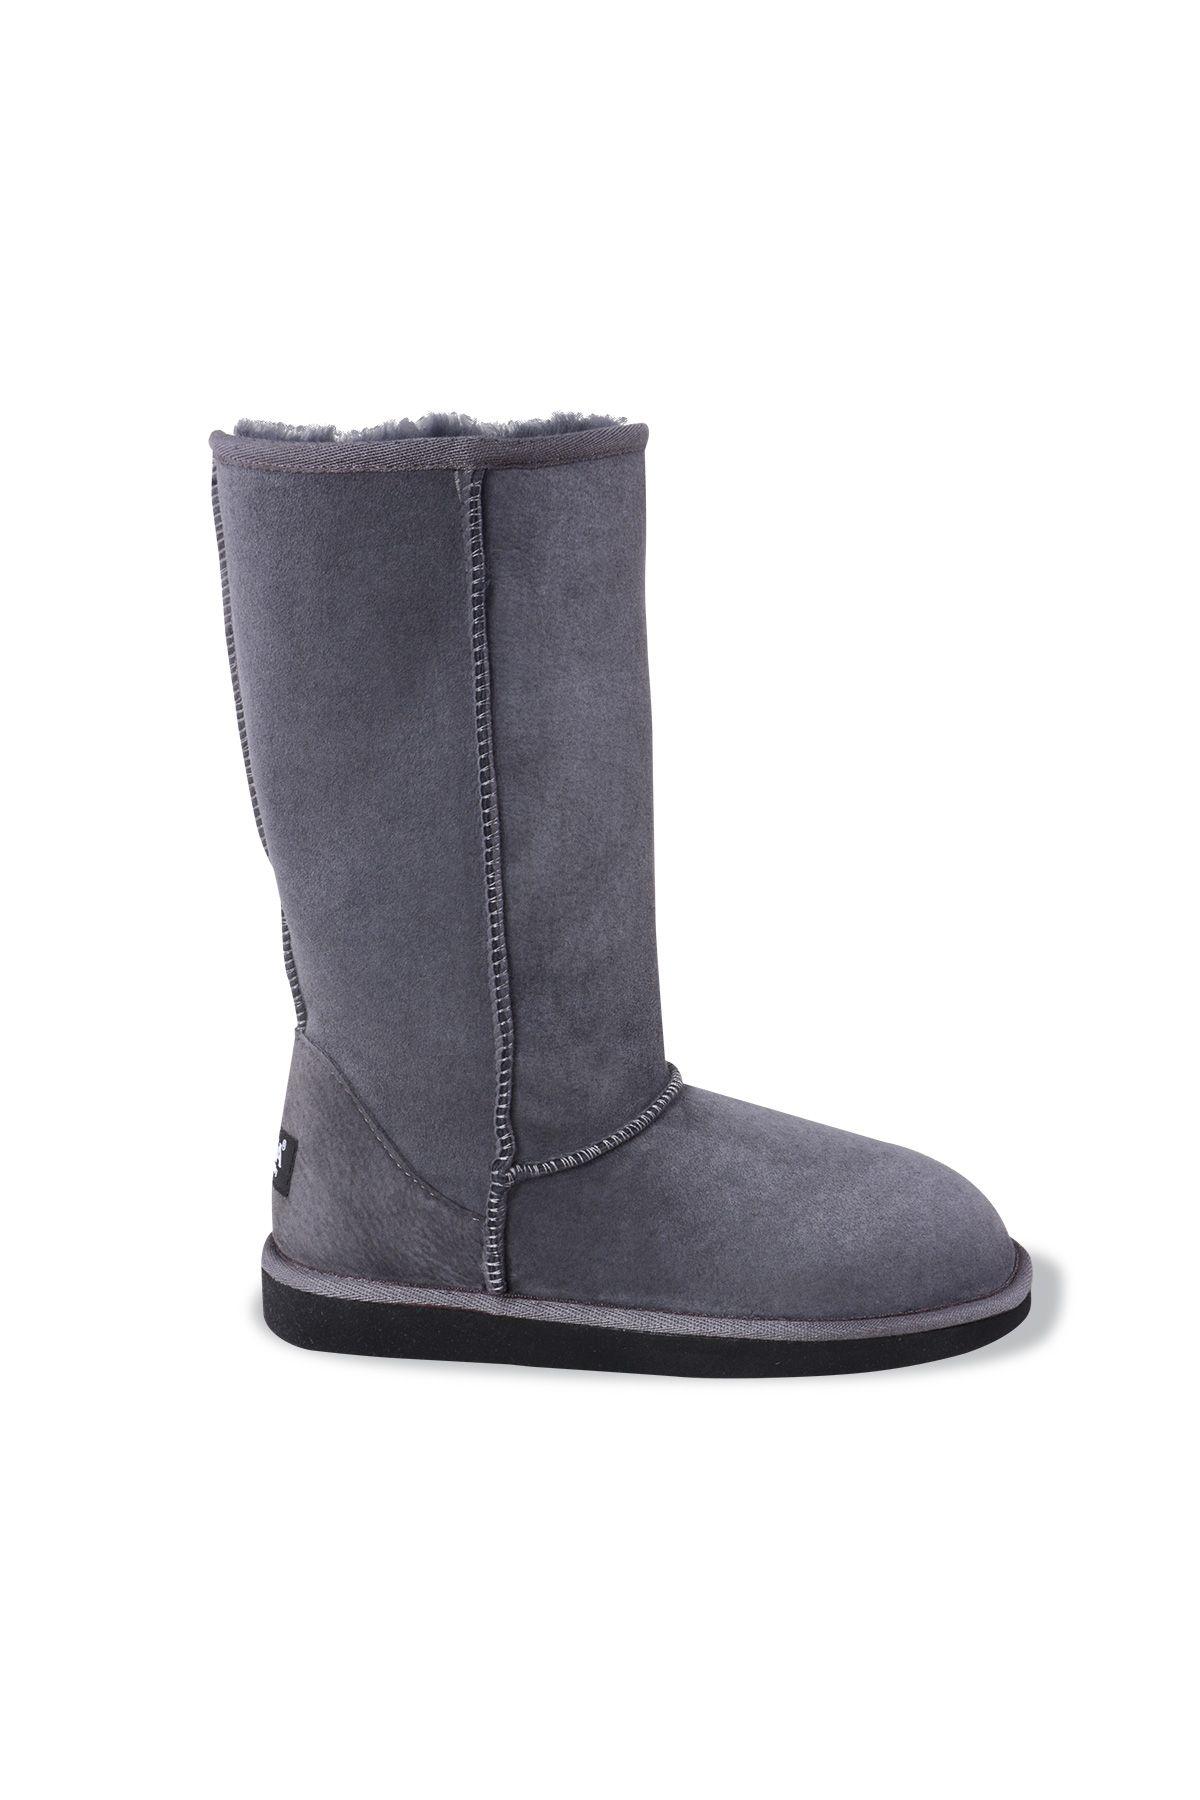 Pegia Long Genuine Suede & Shearling Women's Boots 191001 Gray